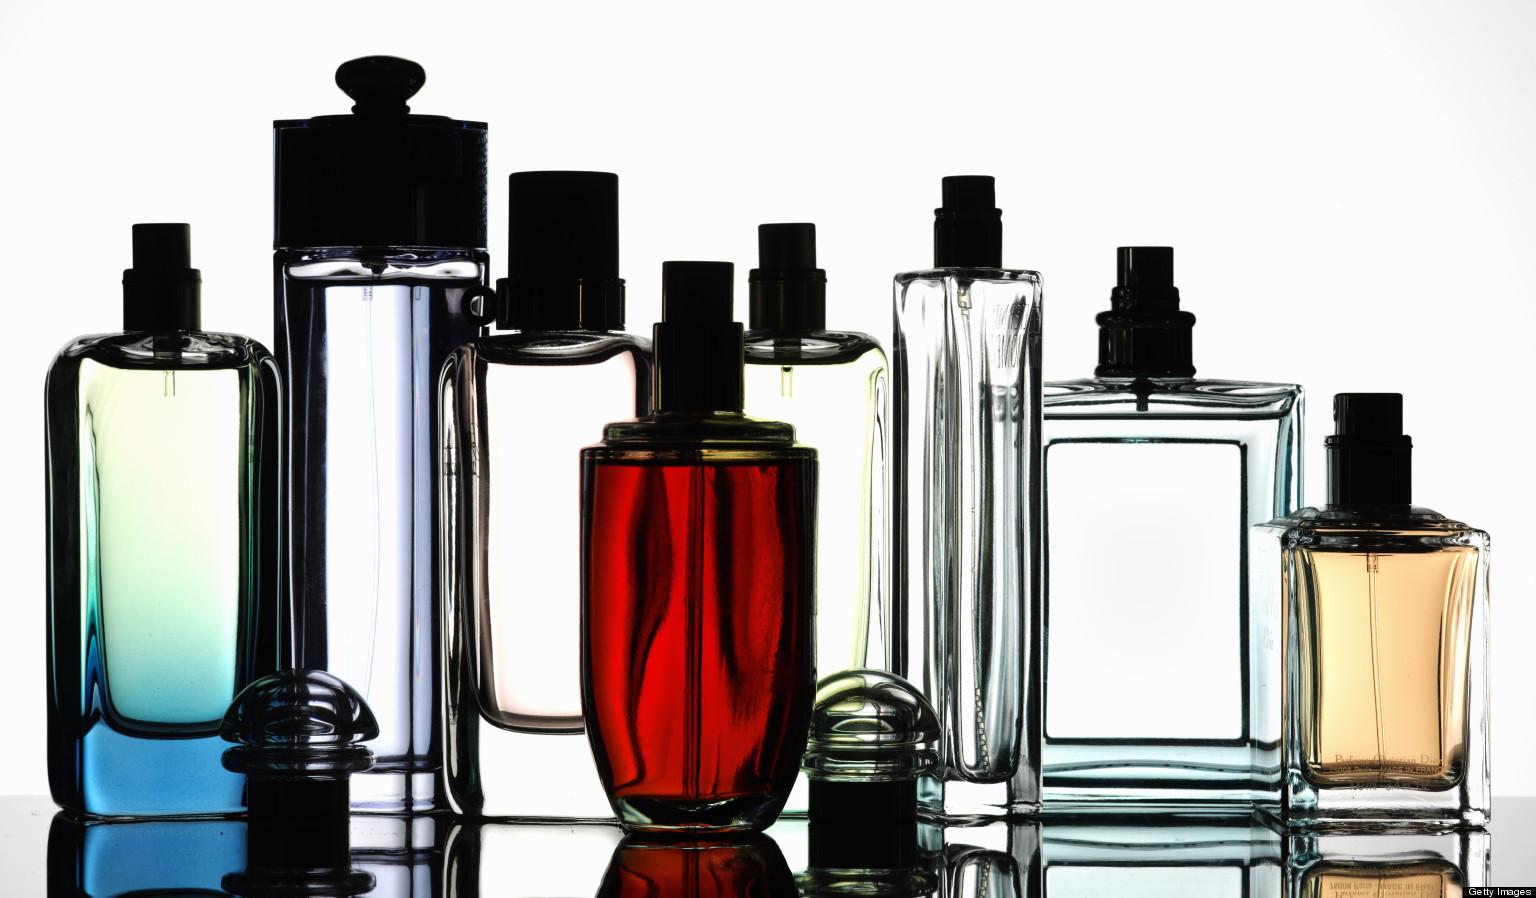 Image of perfumes